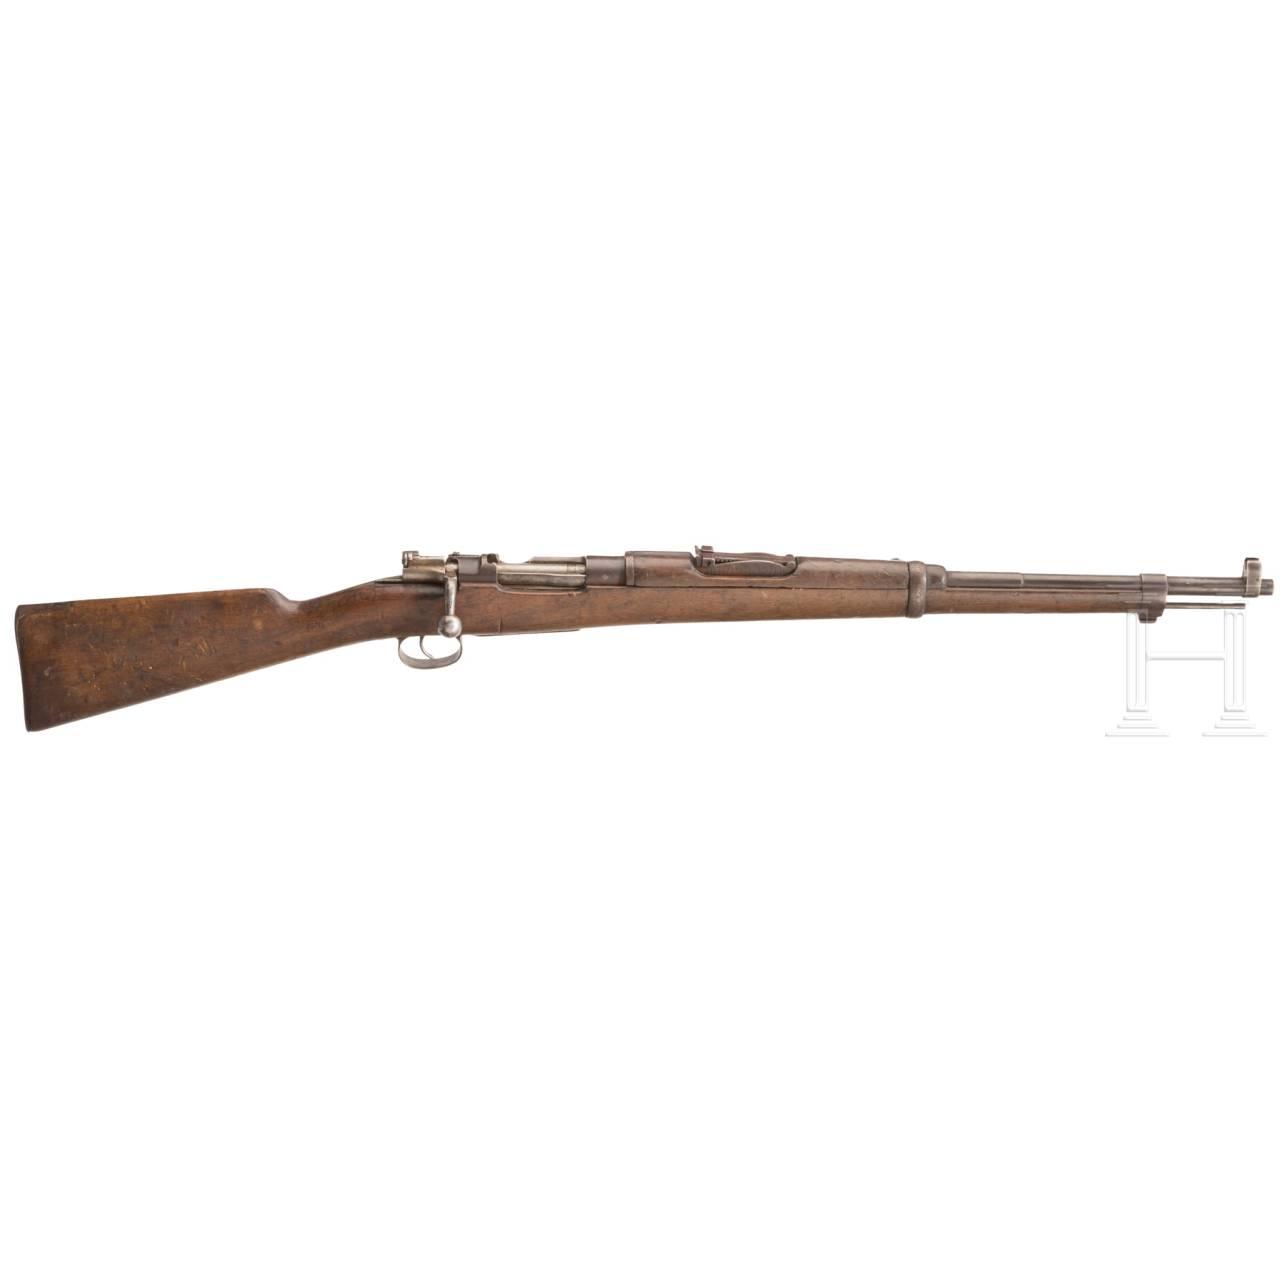 Kurzgewehr Mod. 1916